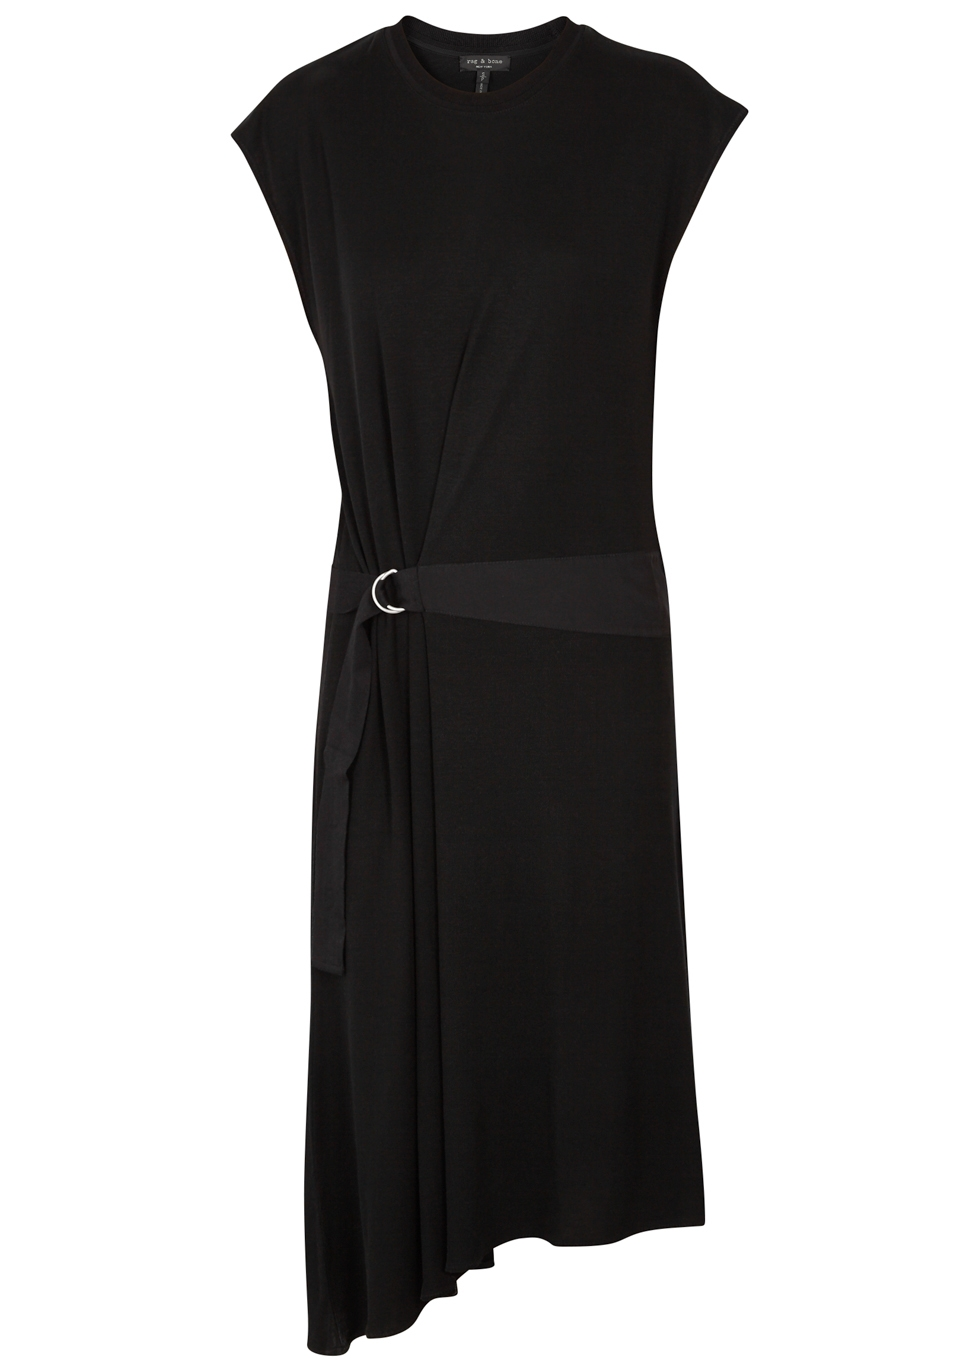 RAG & BONE OPHELIA ASYMMETRIC KNITTED DRESS